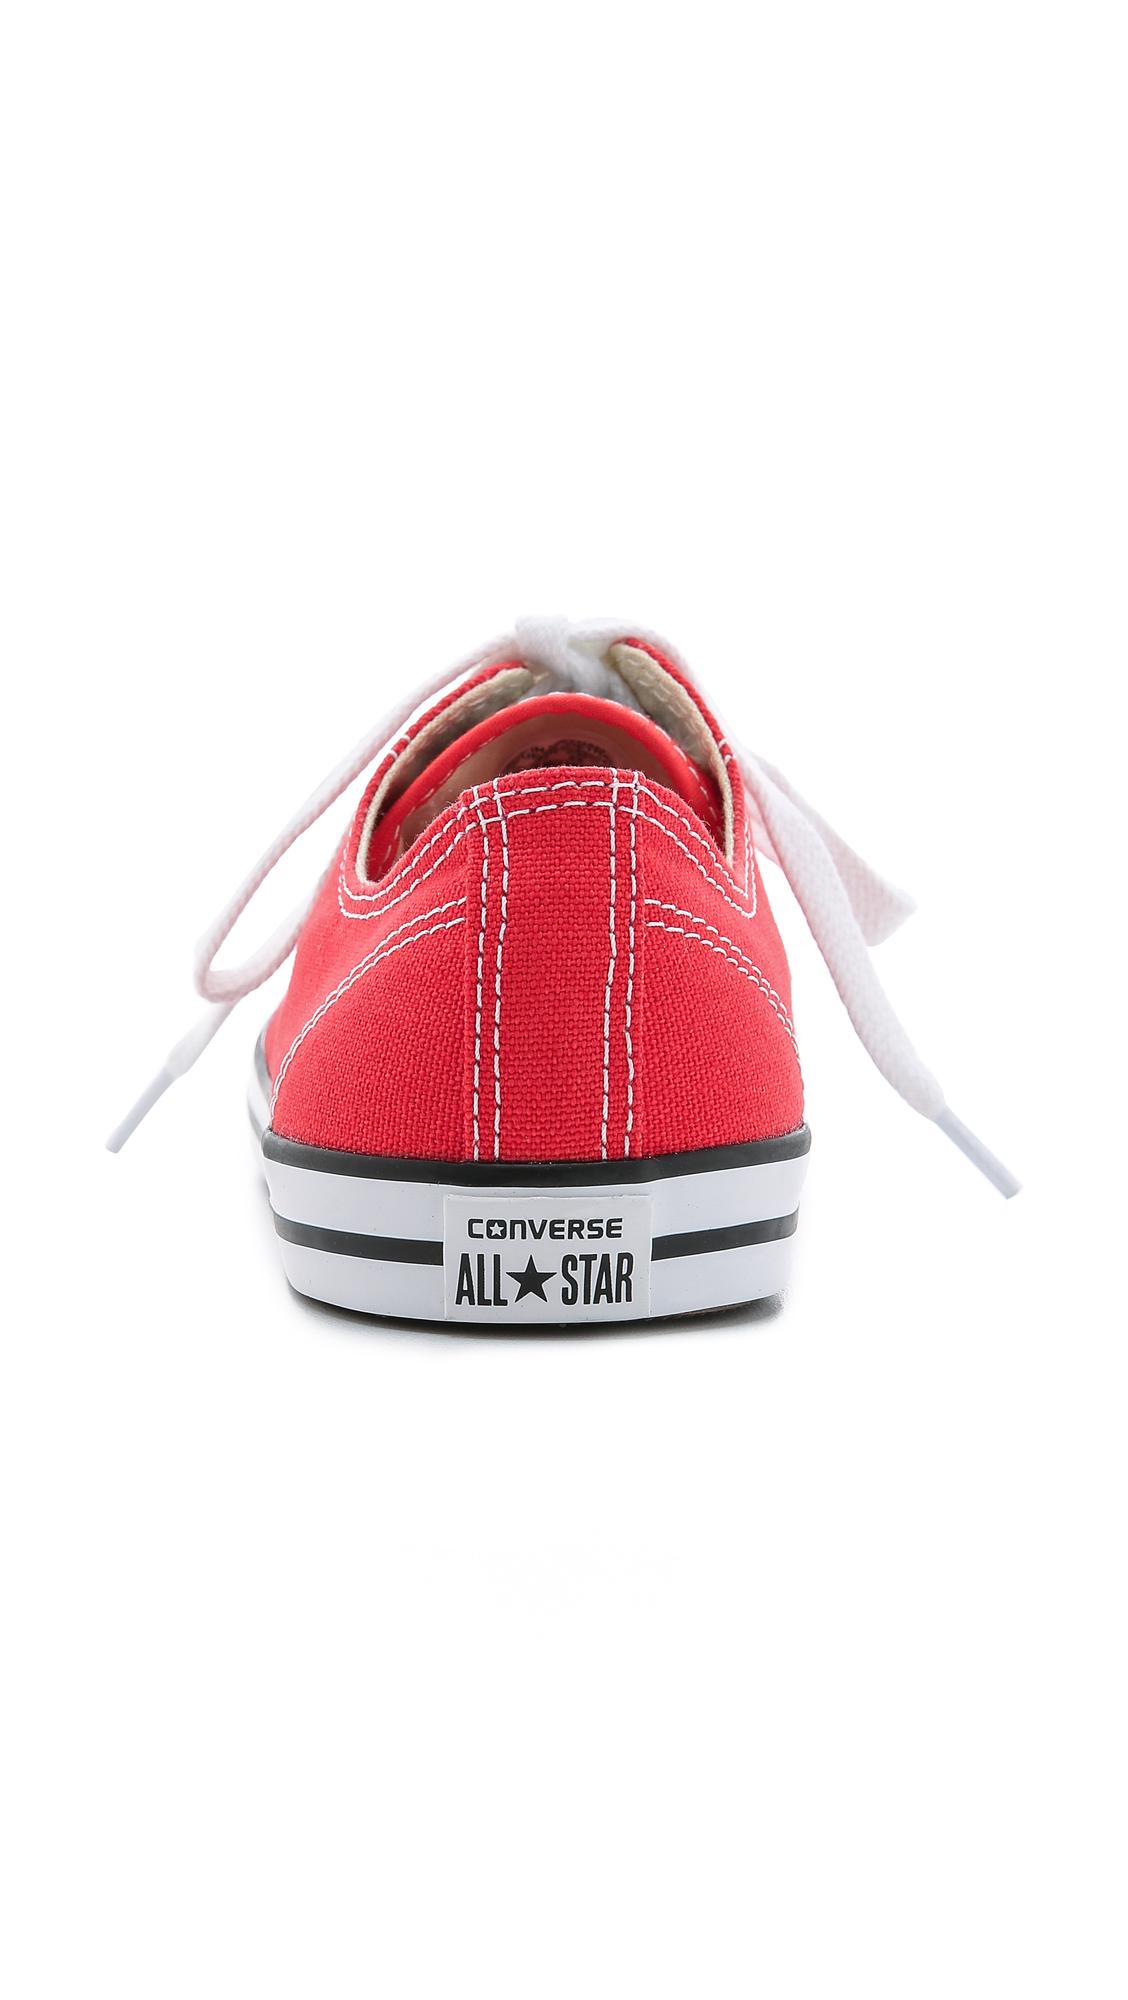 df581d287ec4 Converse Chuck Taylor All Star Dainty Sneakers